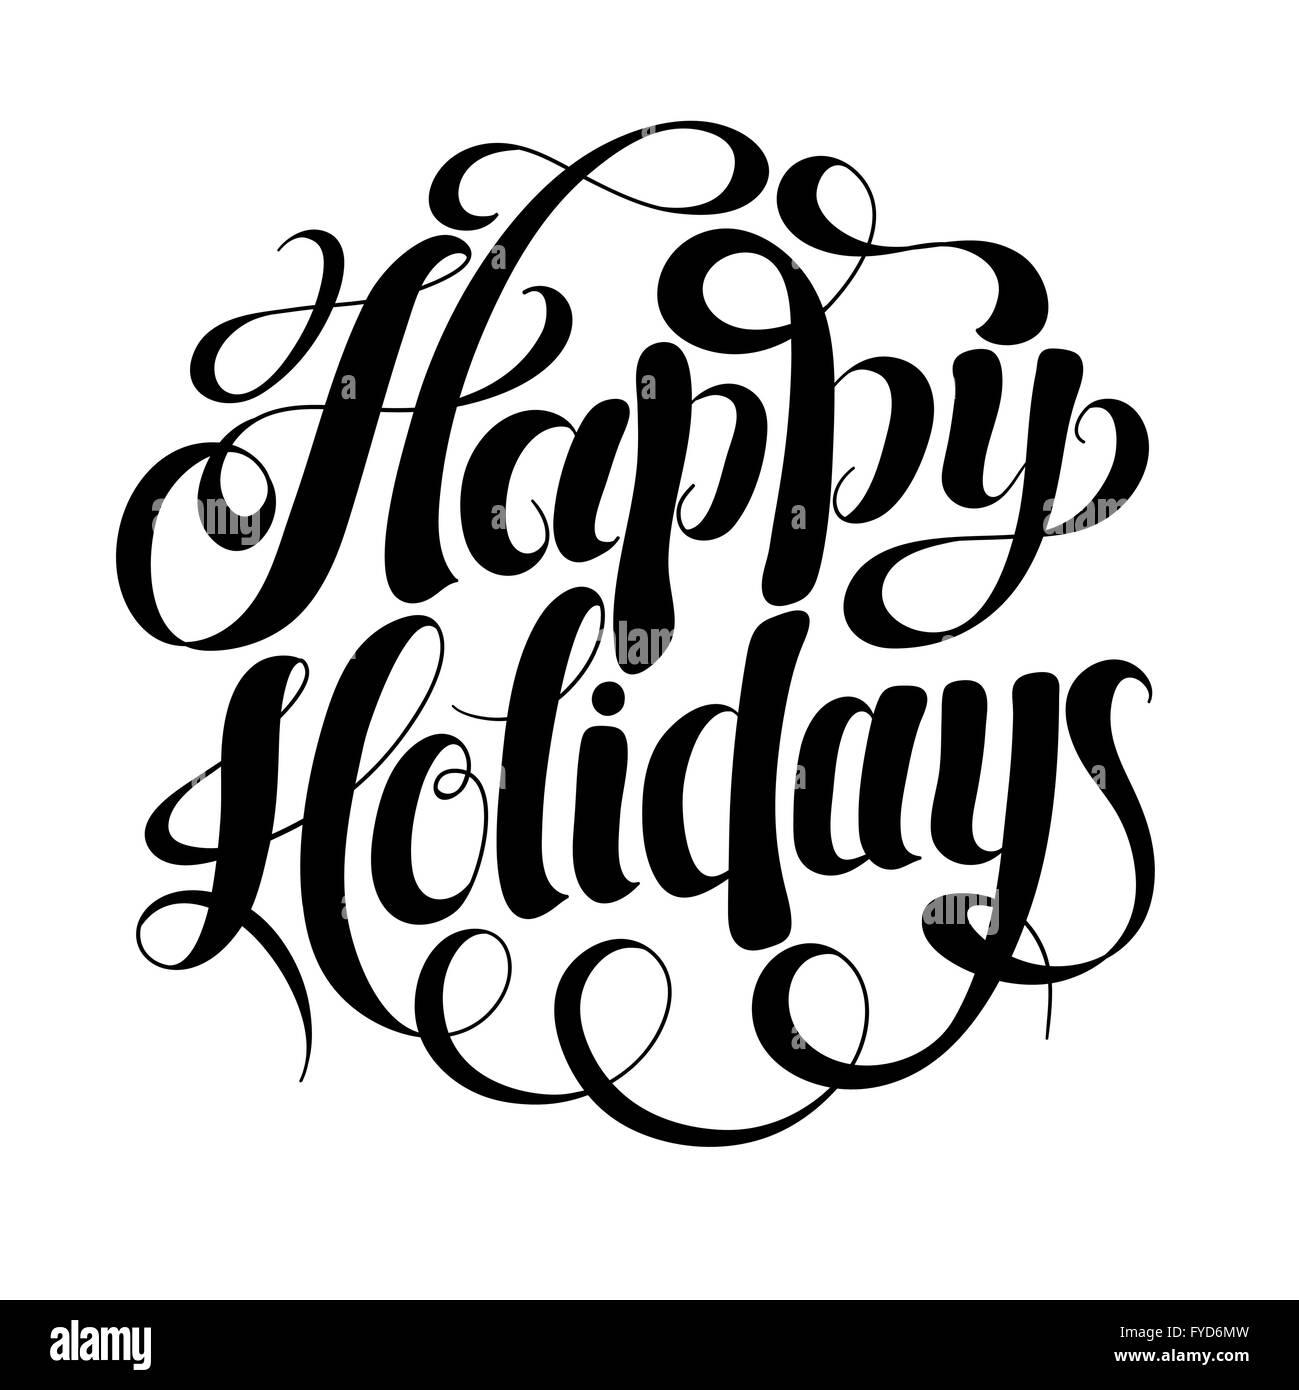 black and white calligraphic happy holidays hand writing